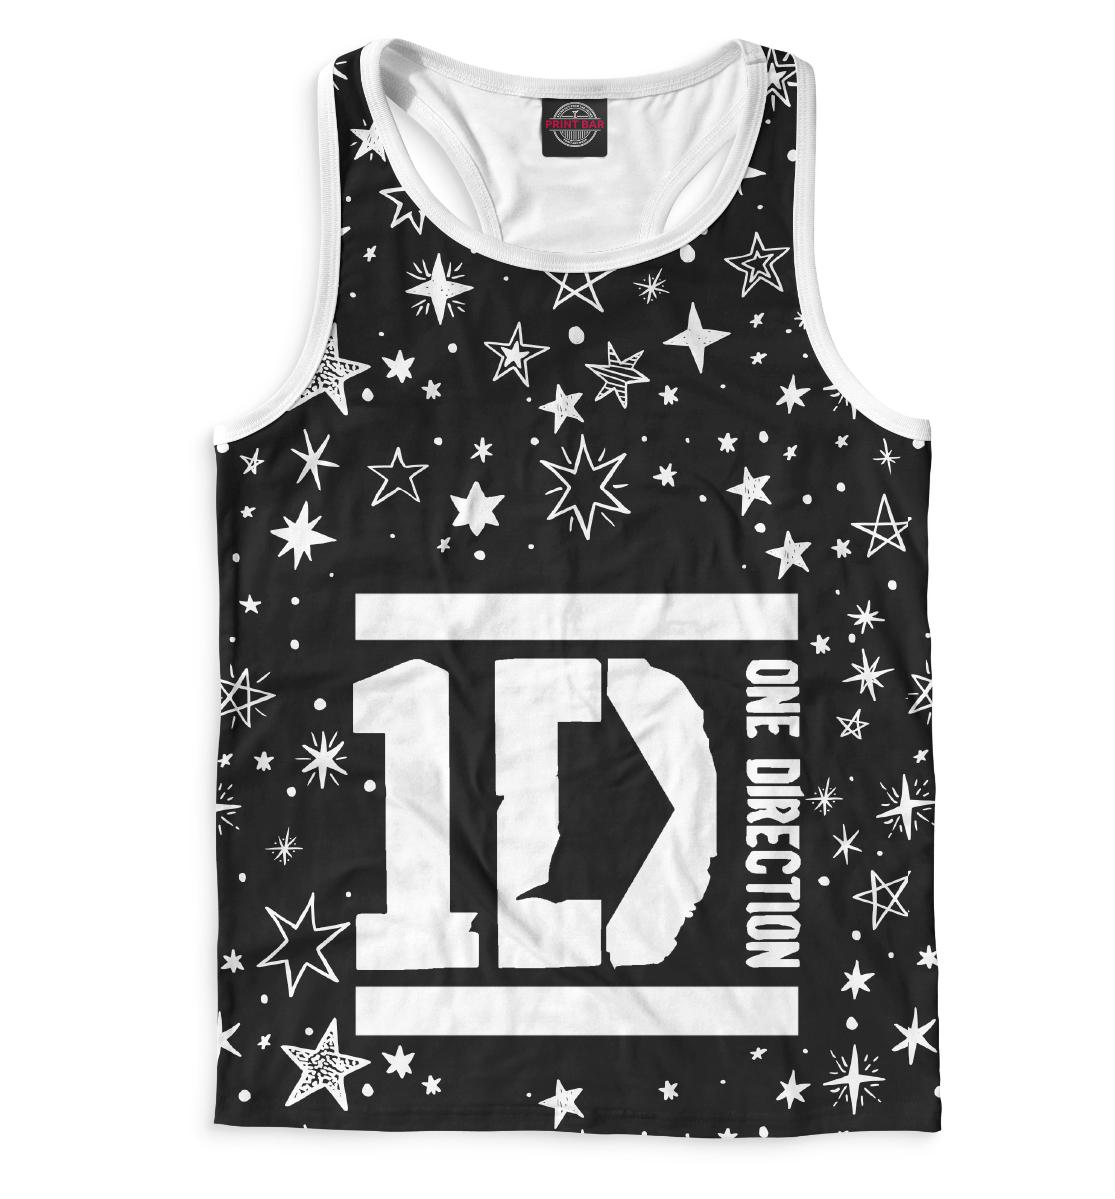 Купить One Direction, Printbar, Майки борцовки, OND-942964-mayb-2